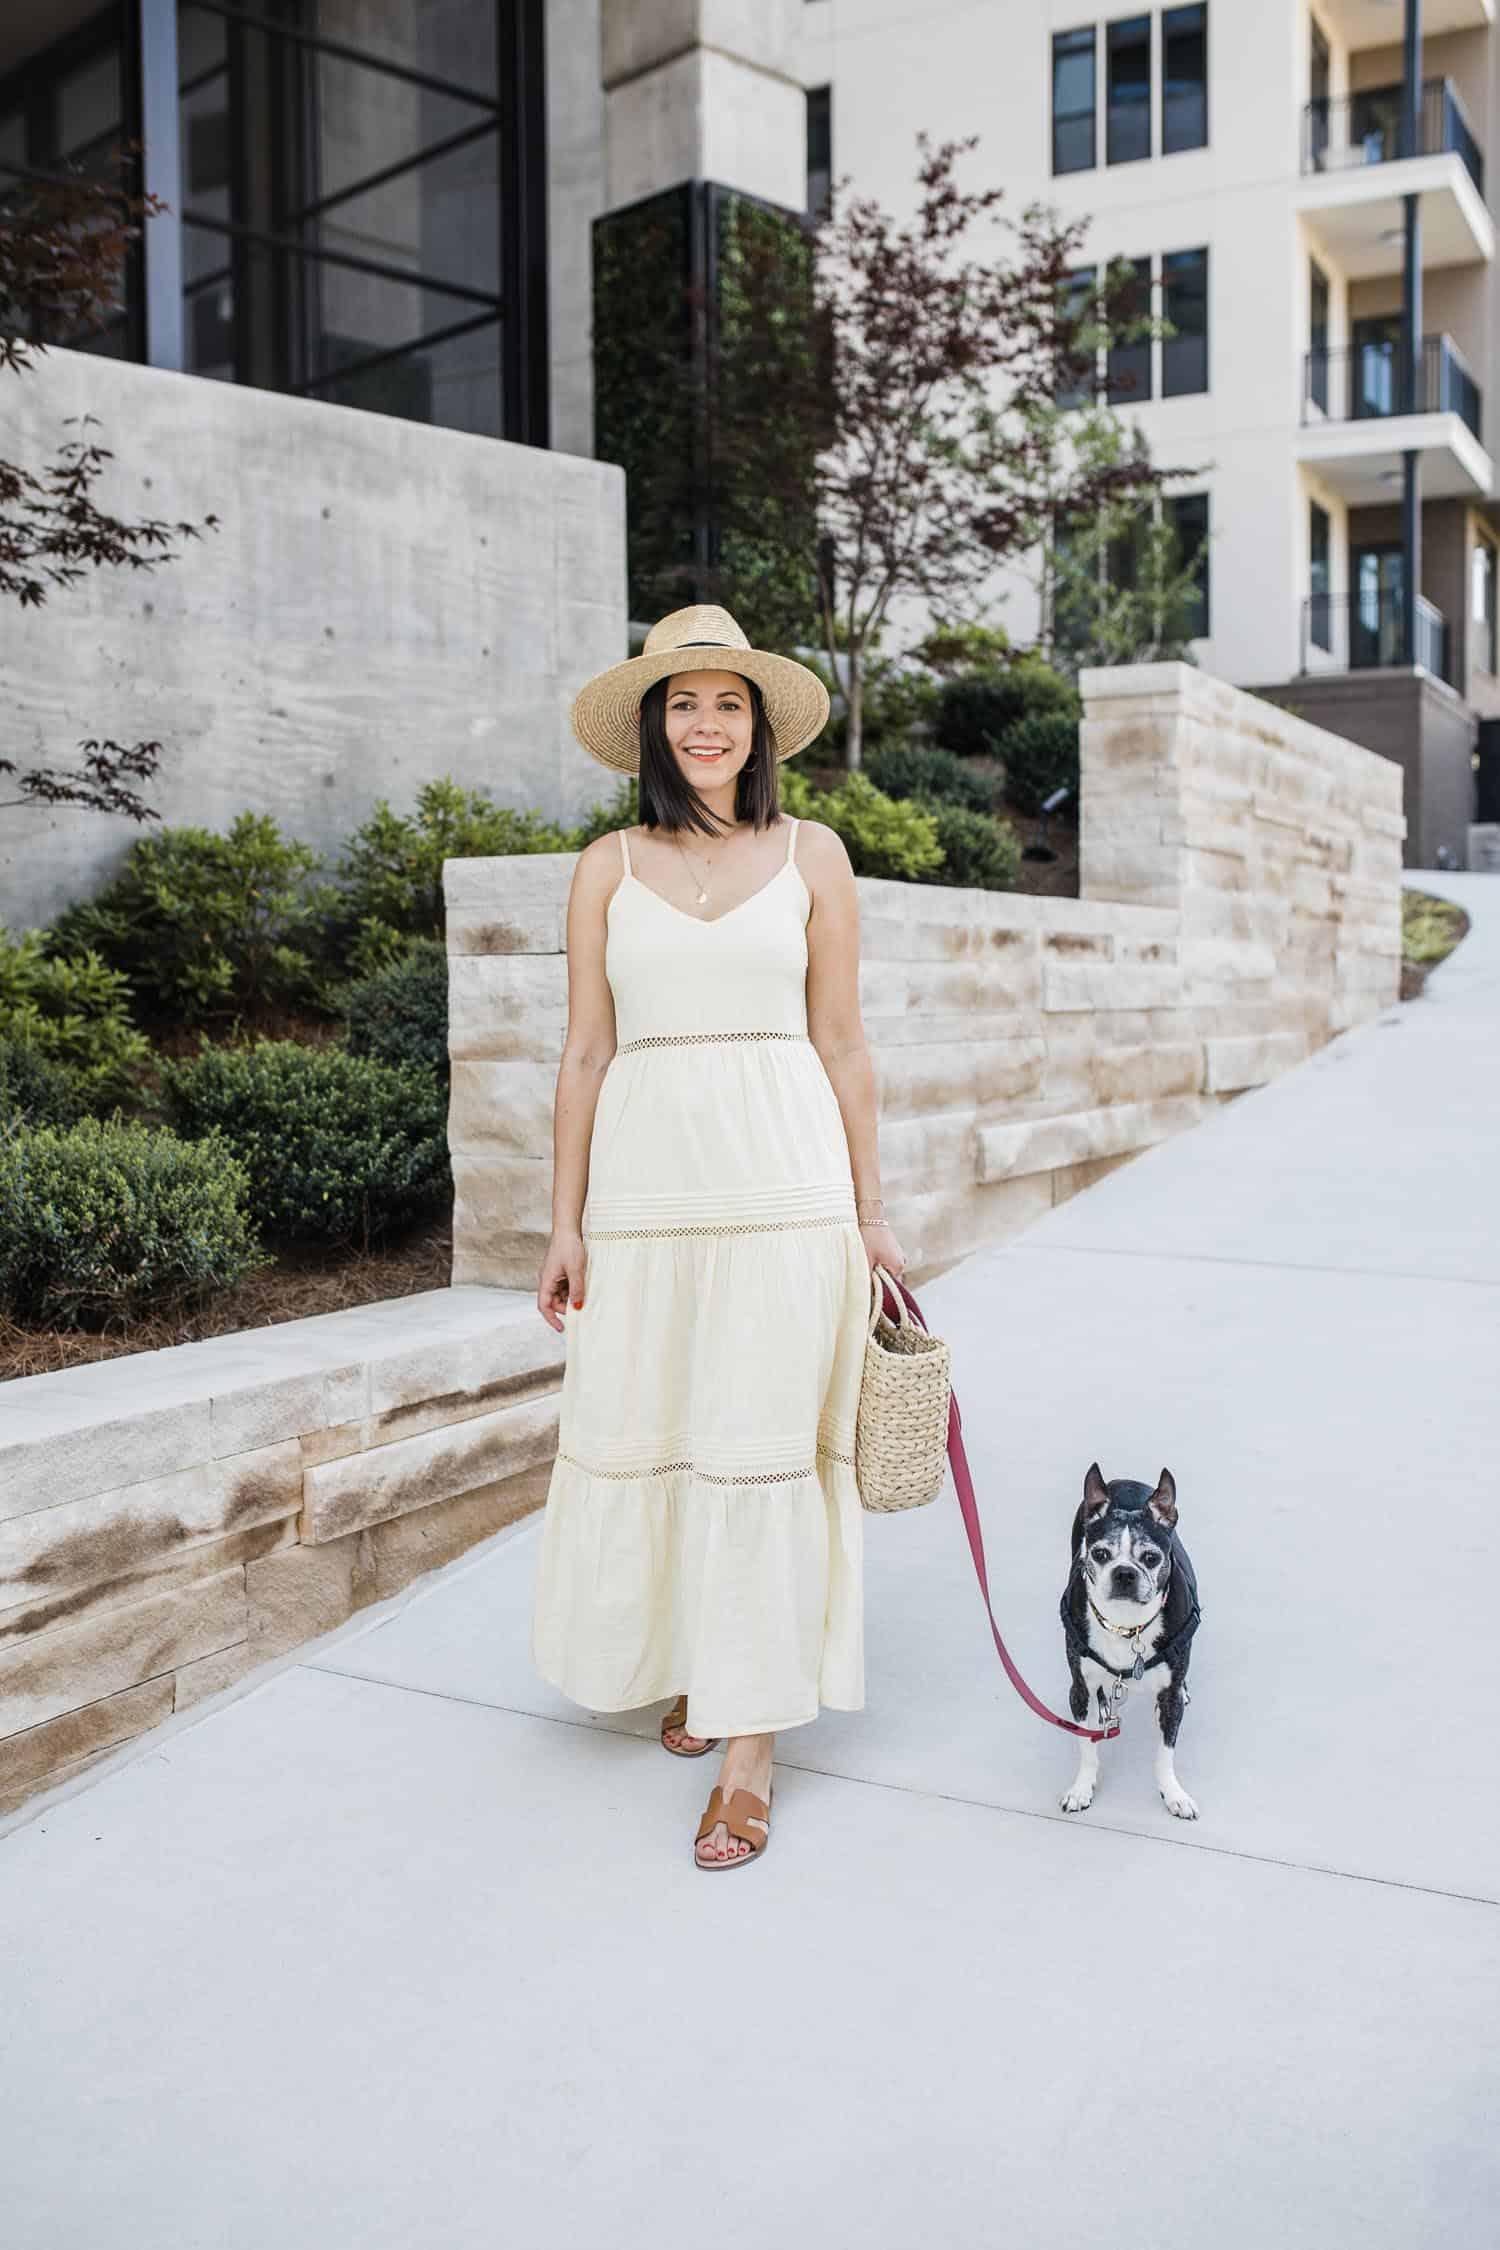 Jessica Camerata wears a yellow maxi dress